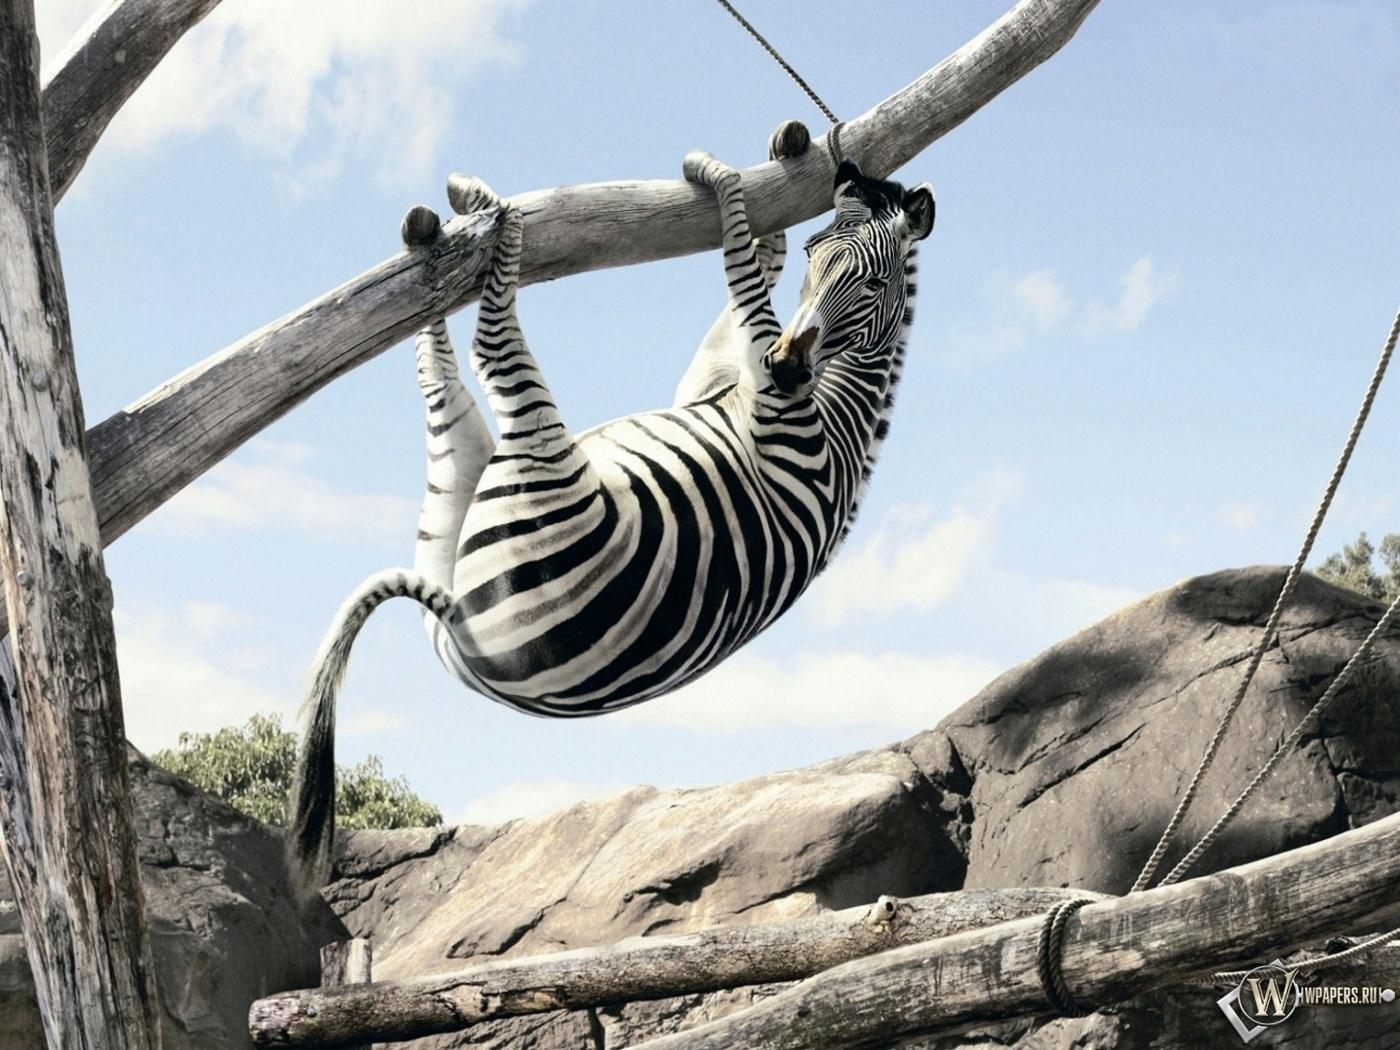 Зебра вверх ногами на дереве 1400x1050